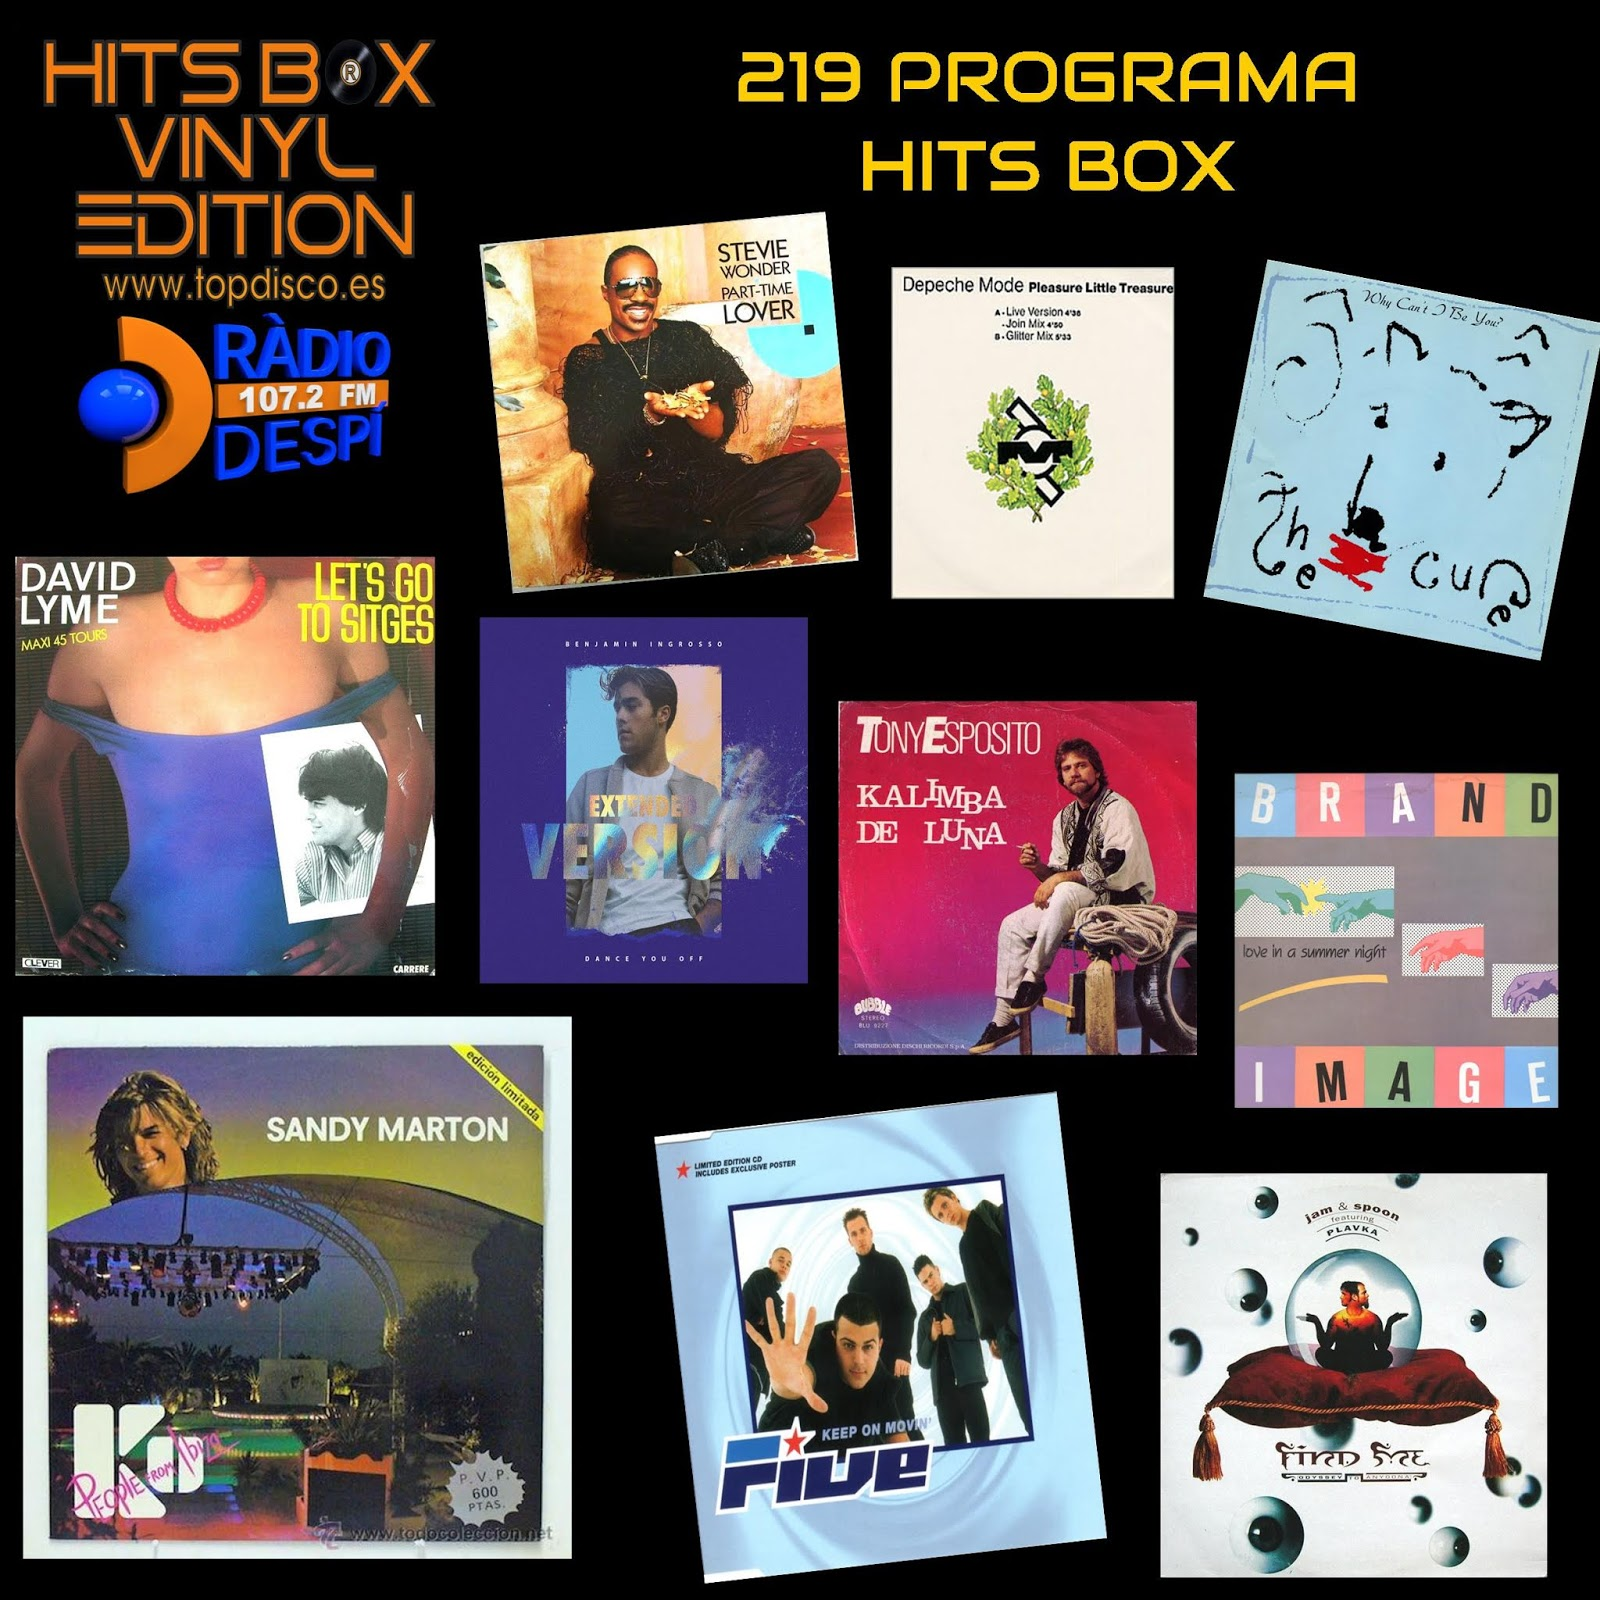 219 Programa Hits Box Vinyl Edition